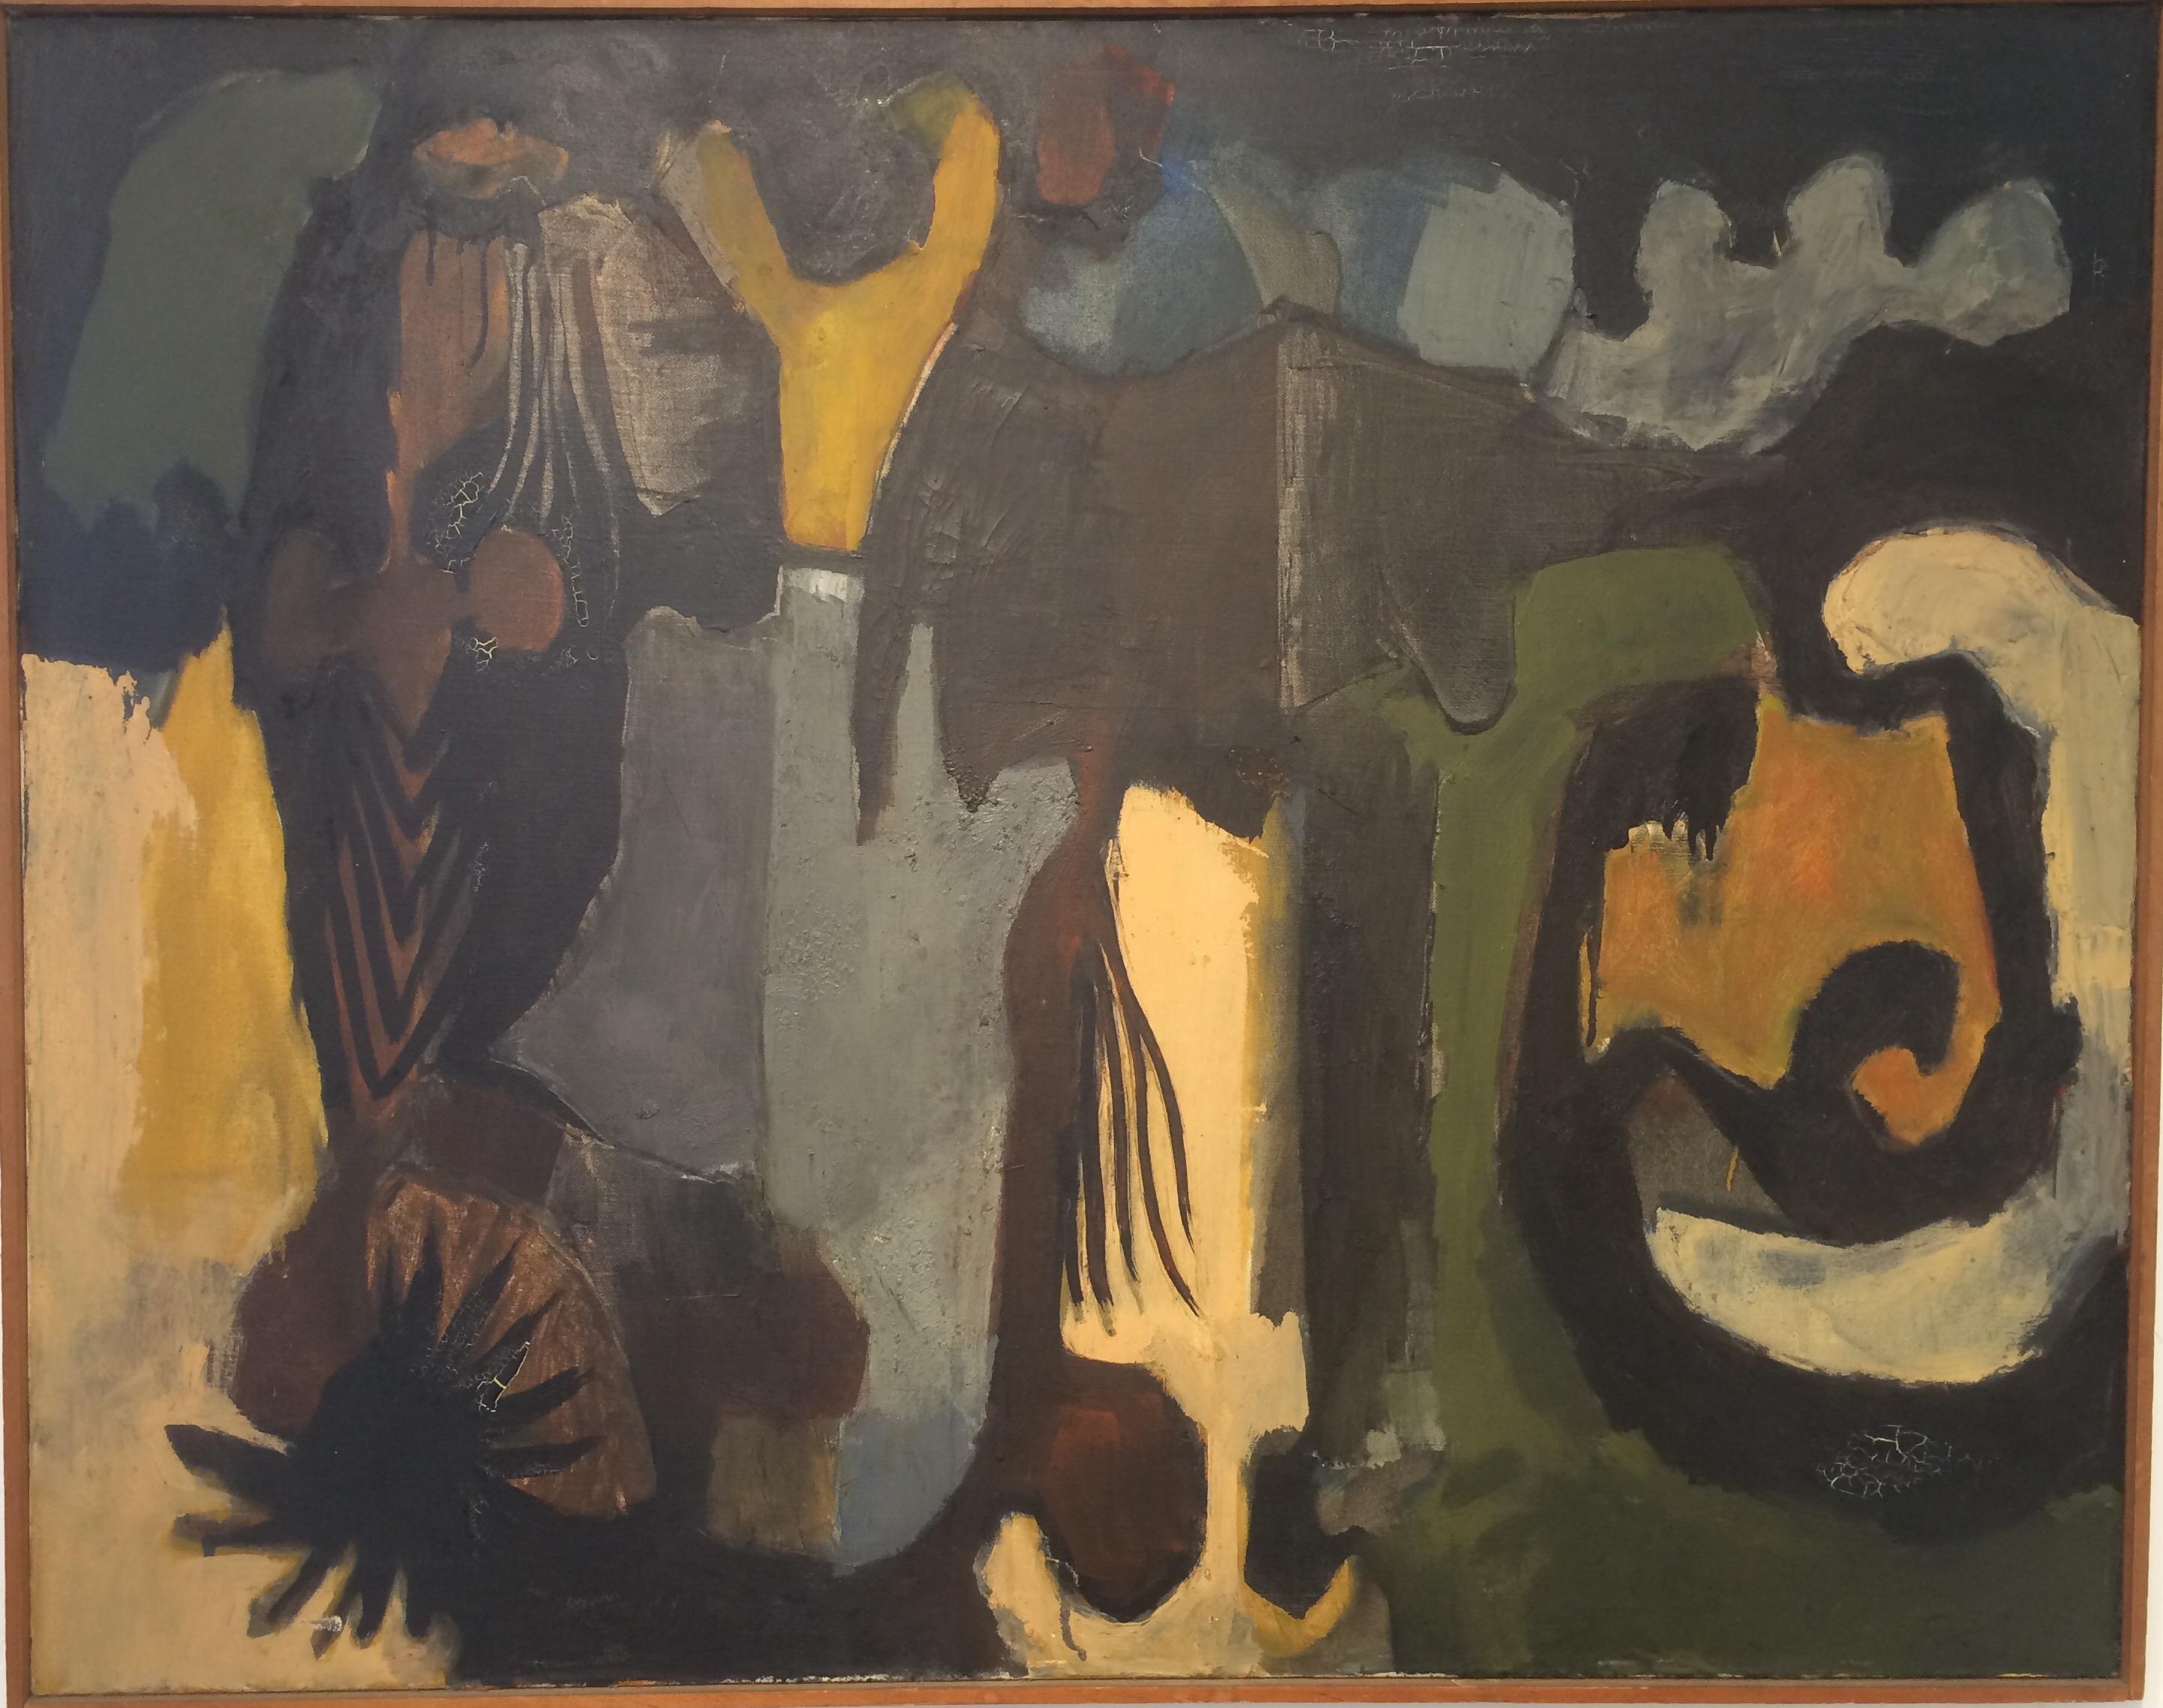 Frank Lobdell 1948 30x38